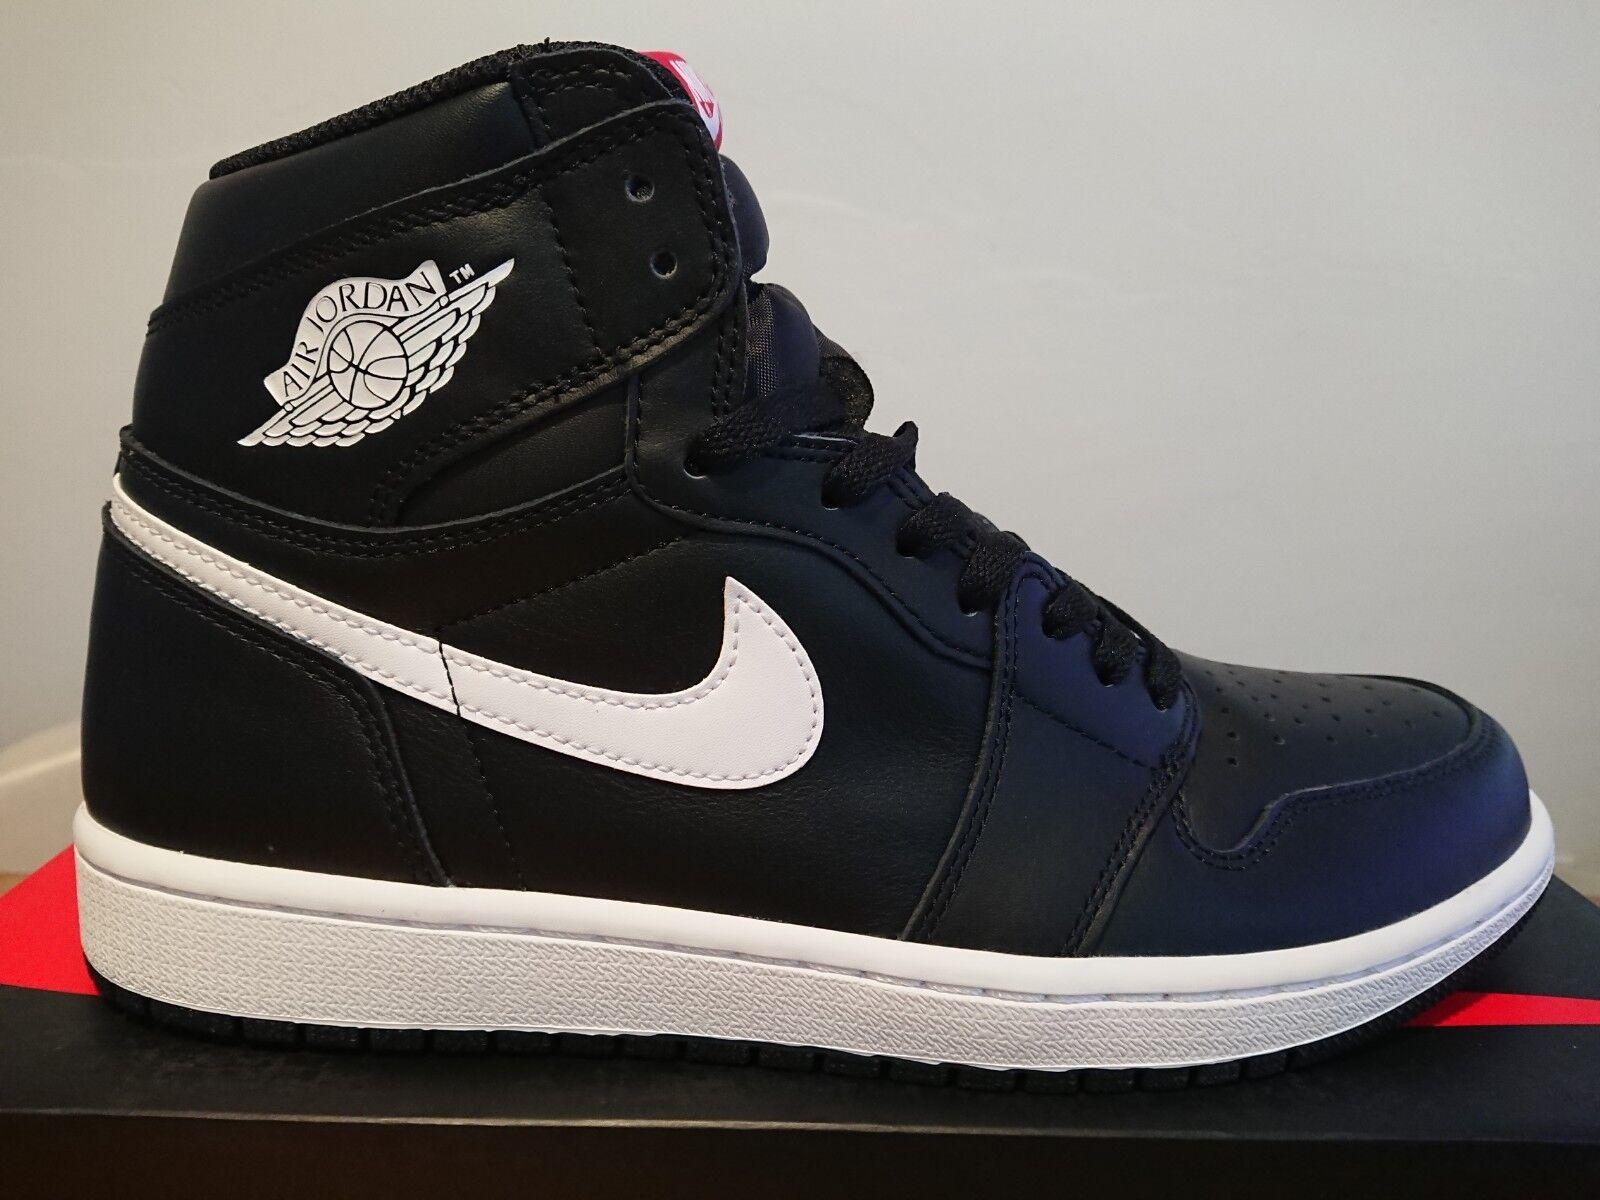 Nike air jordan jordan jordan 1 'alto og yin - yang pacchetto nero 10 222aae